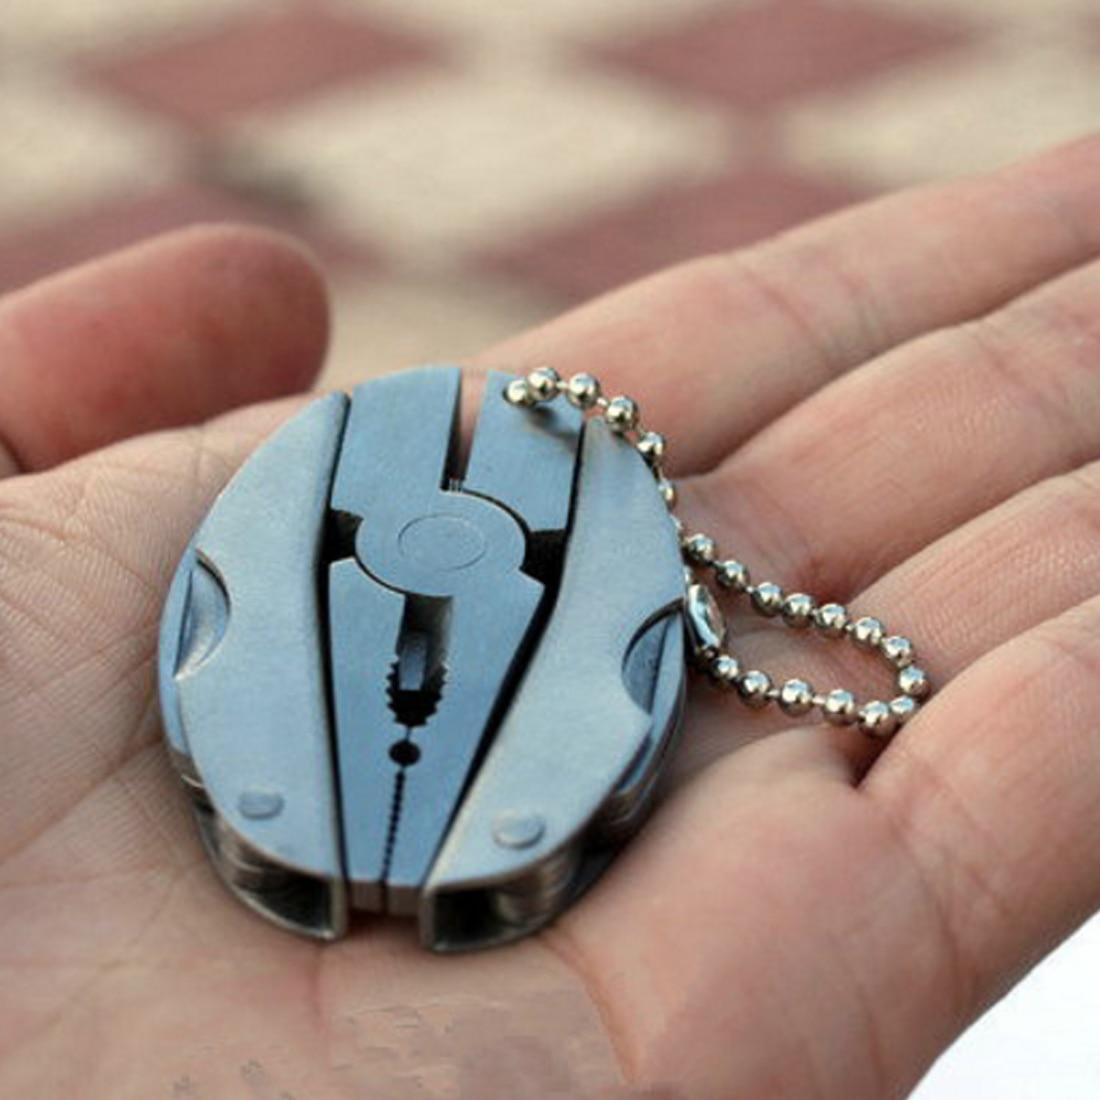 New 1PC Outdoor Mini Folding Muilti-functional Plier Clamp Folding multi - clamp Keychain Outdoor Hiking Tool pocket multitools(China)